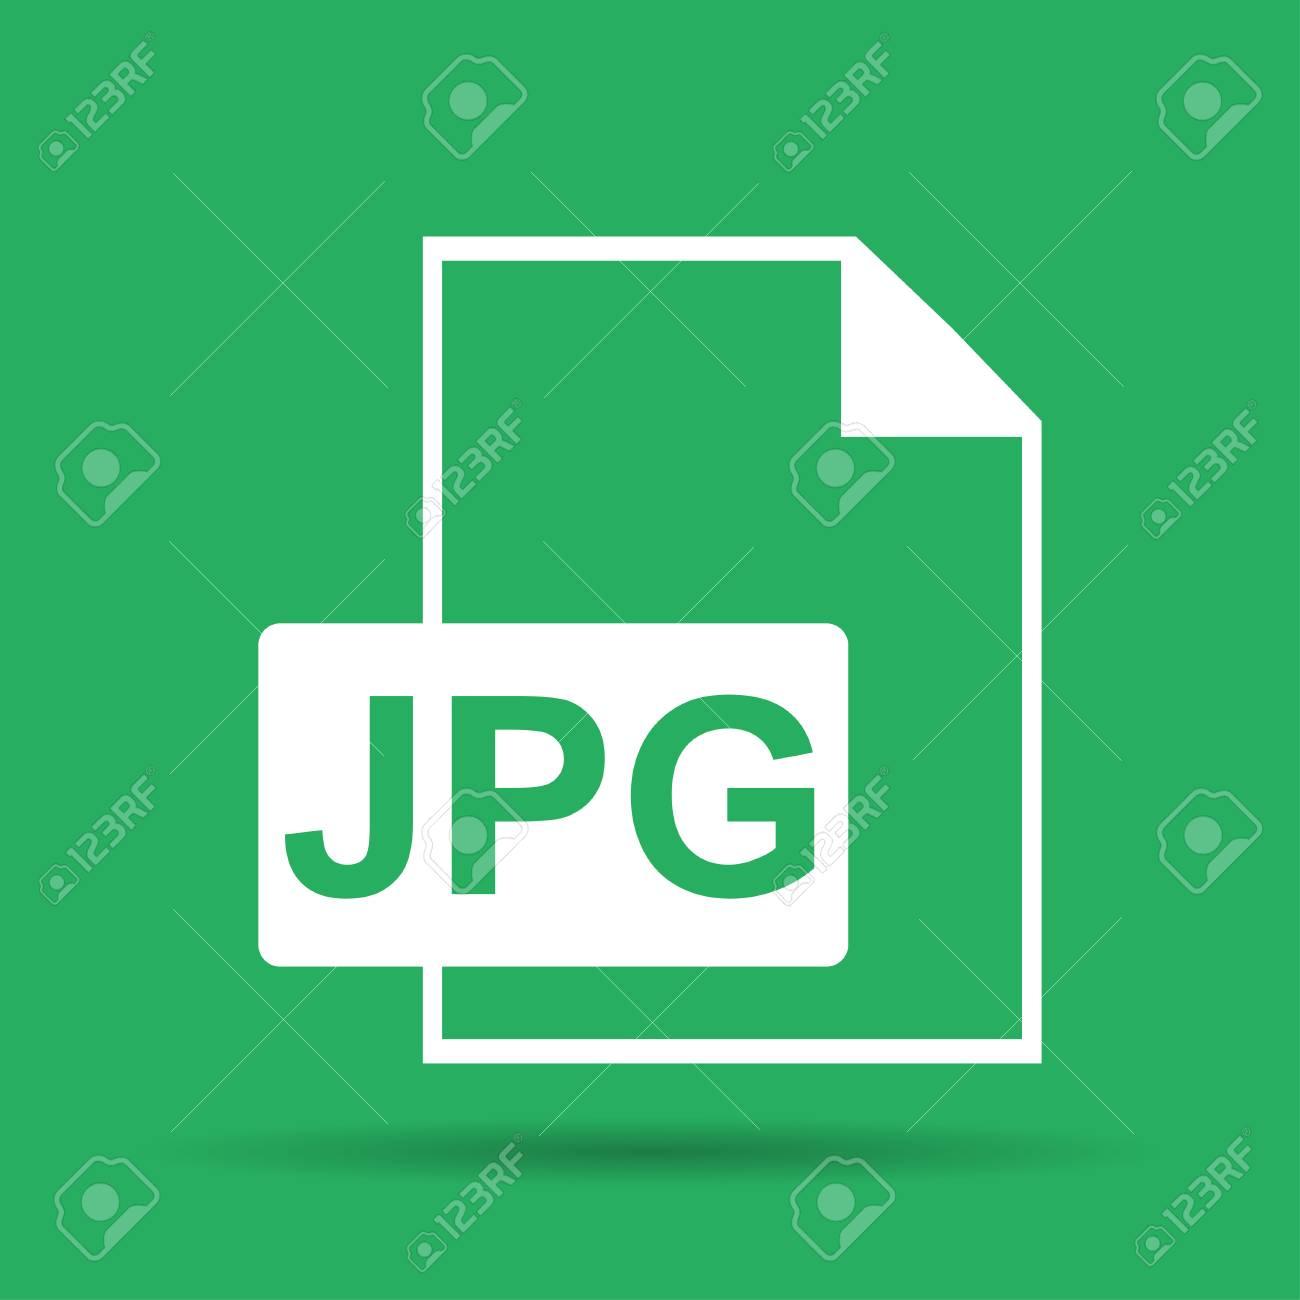 Jpg icon file vector  Flat vector illustrator Eps 10